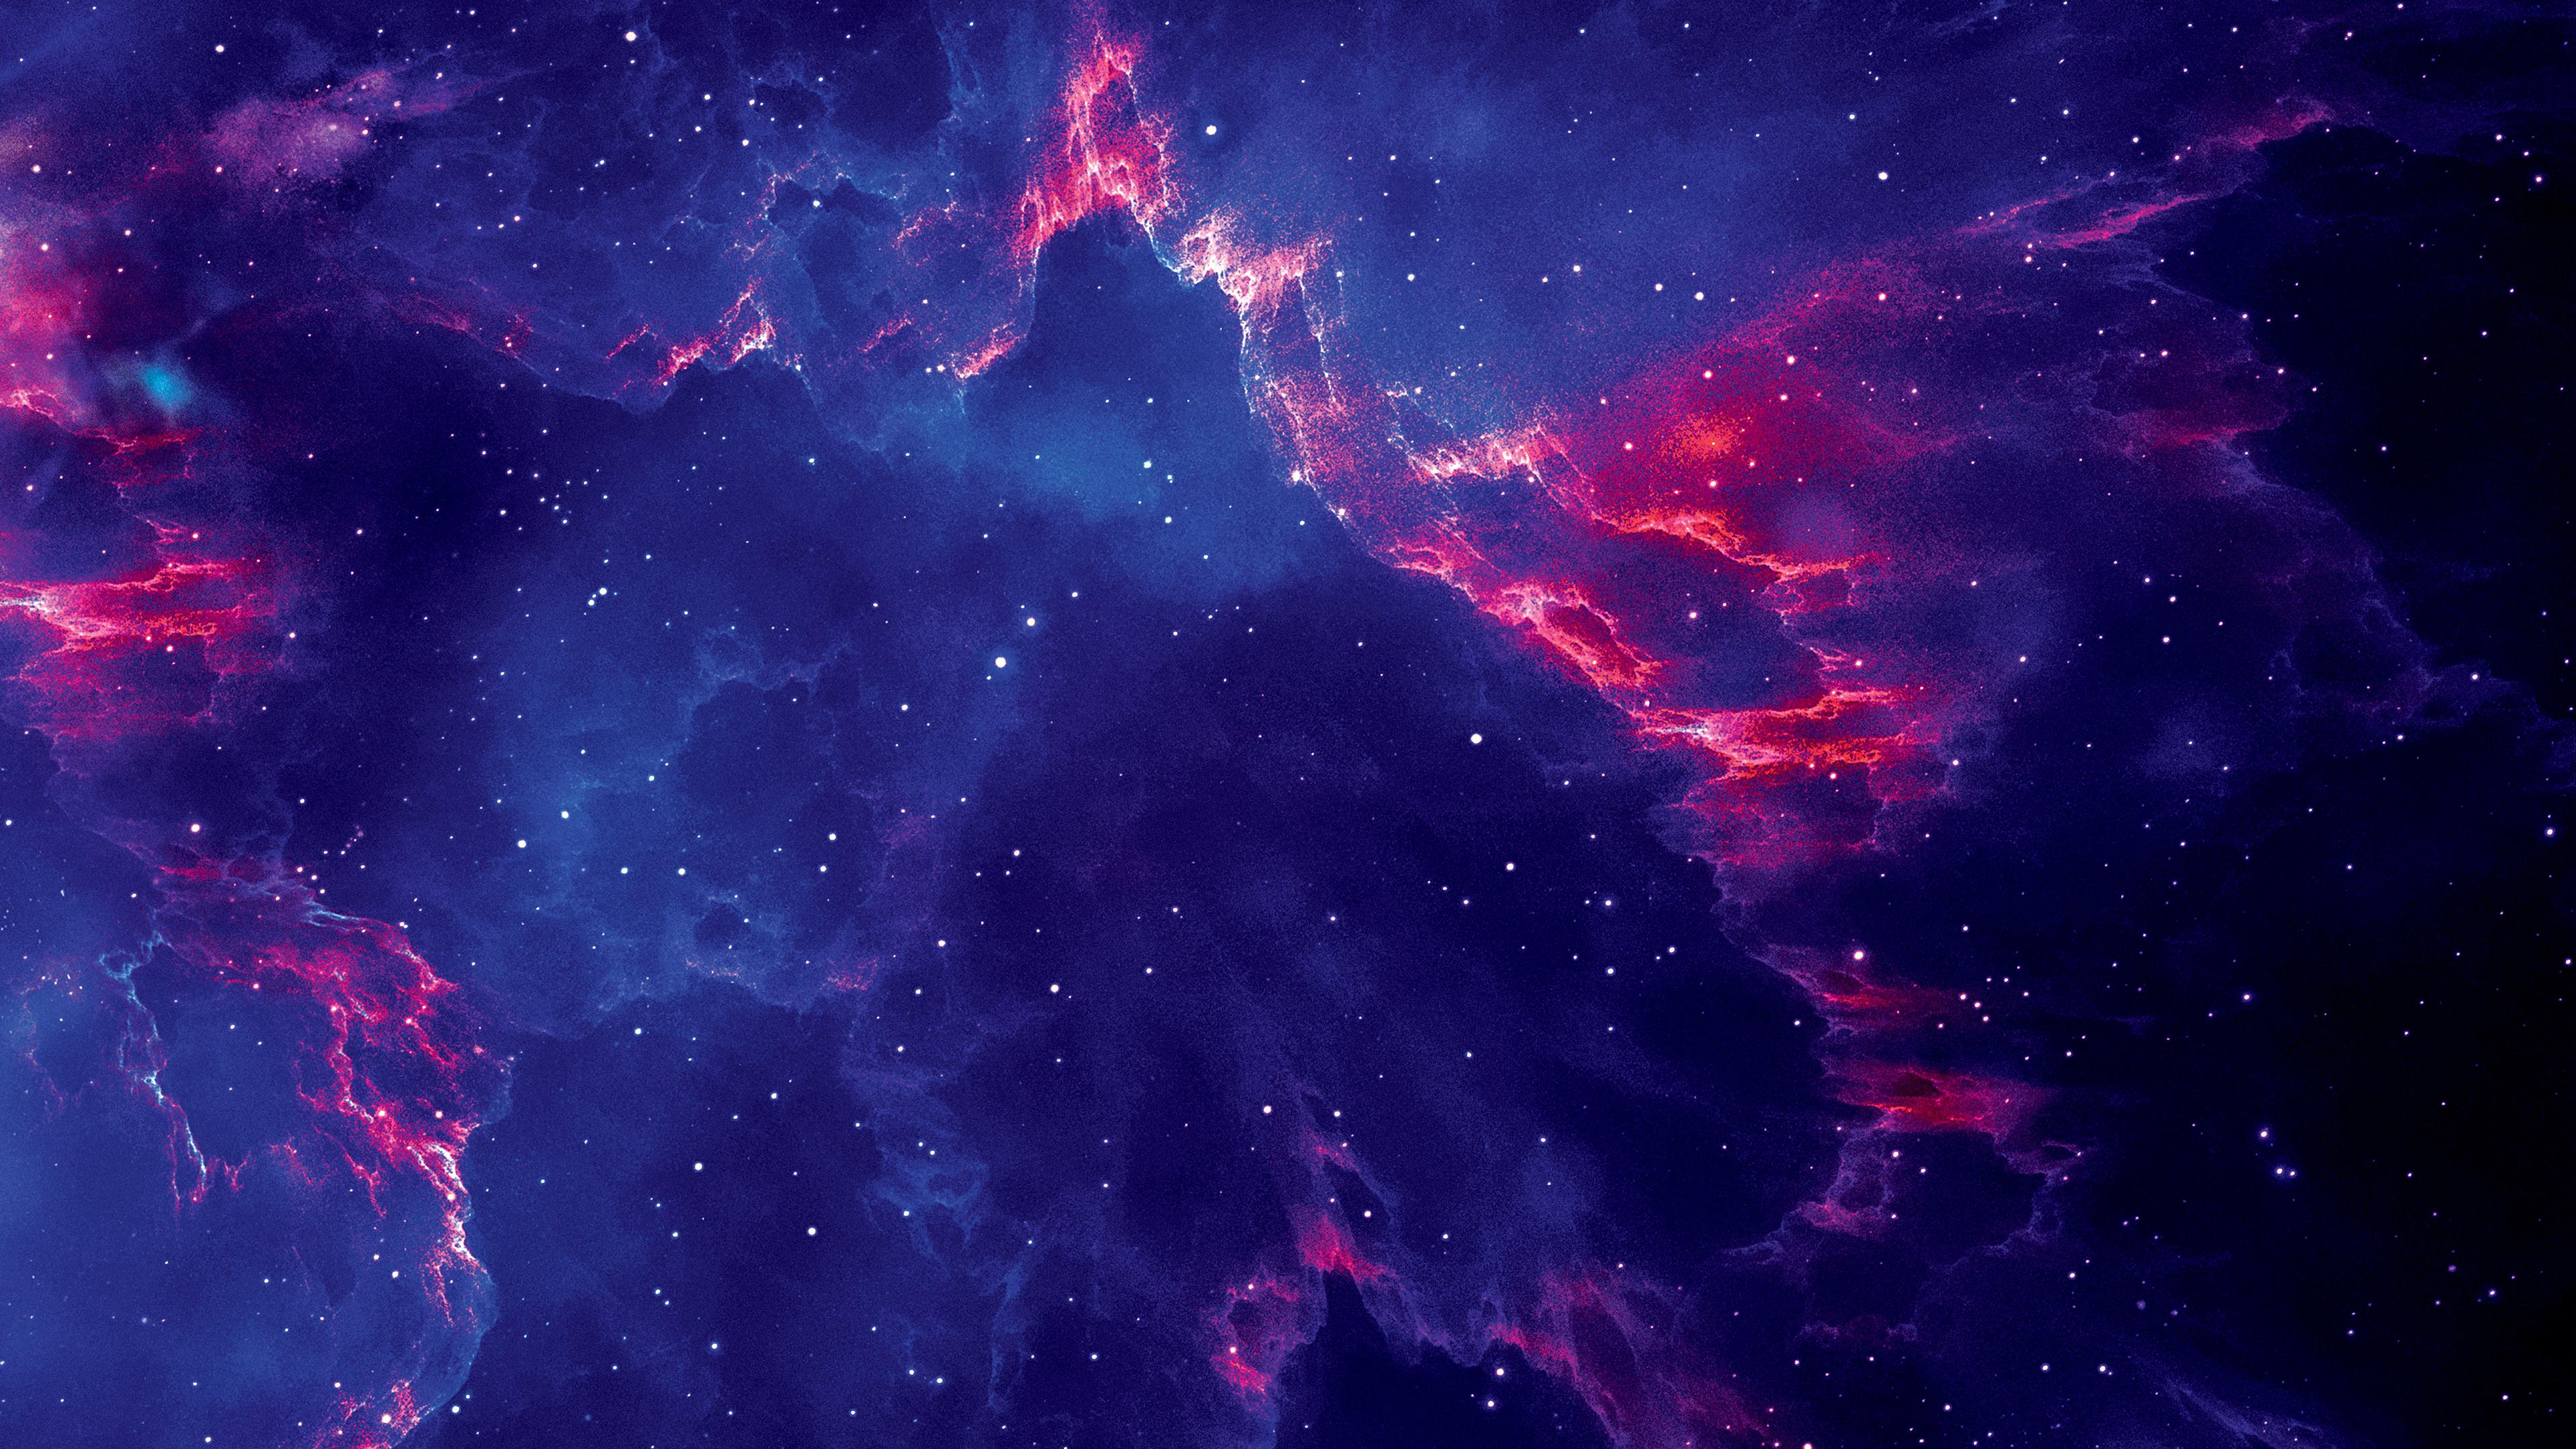 3840x2160 Starry Galaxy 4k Background Hd Artist 4k